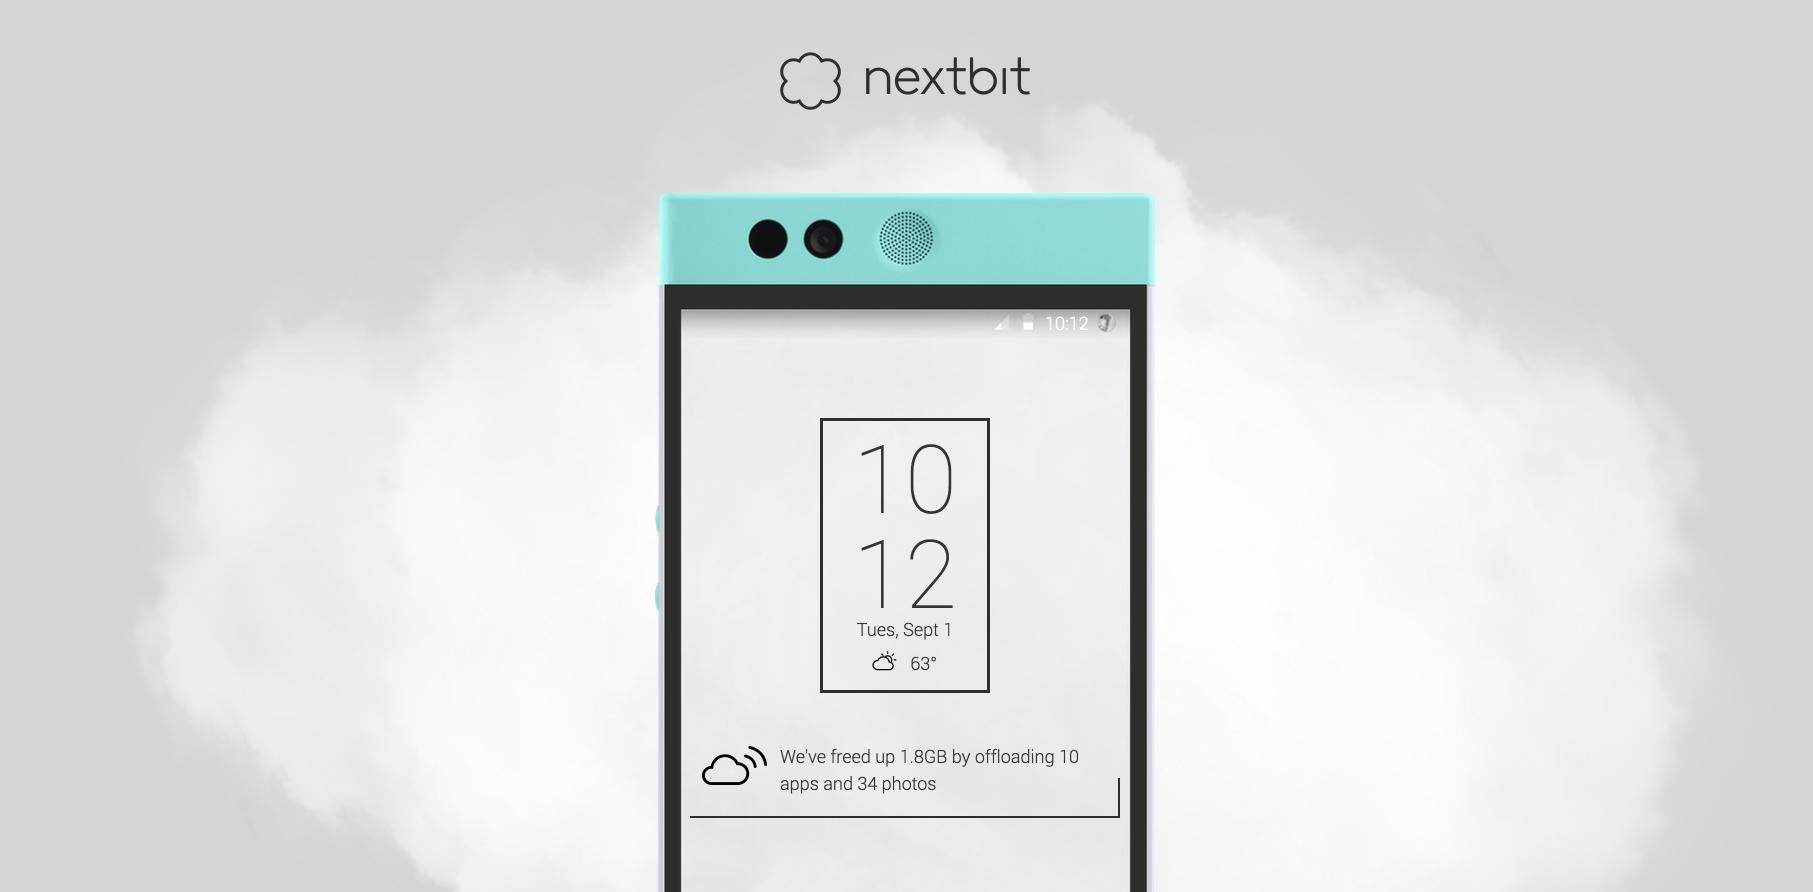 nextbit-2015-09-01-10-12-59